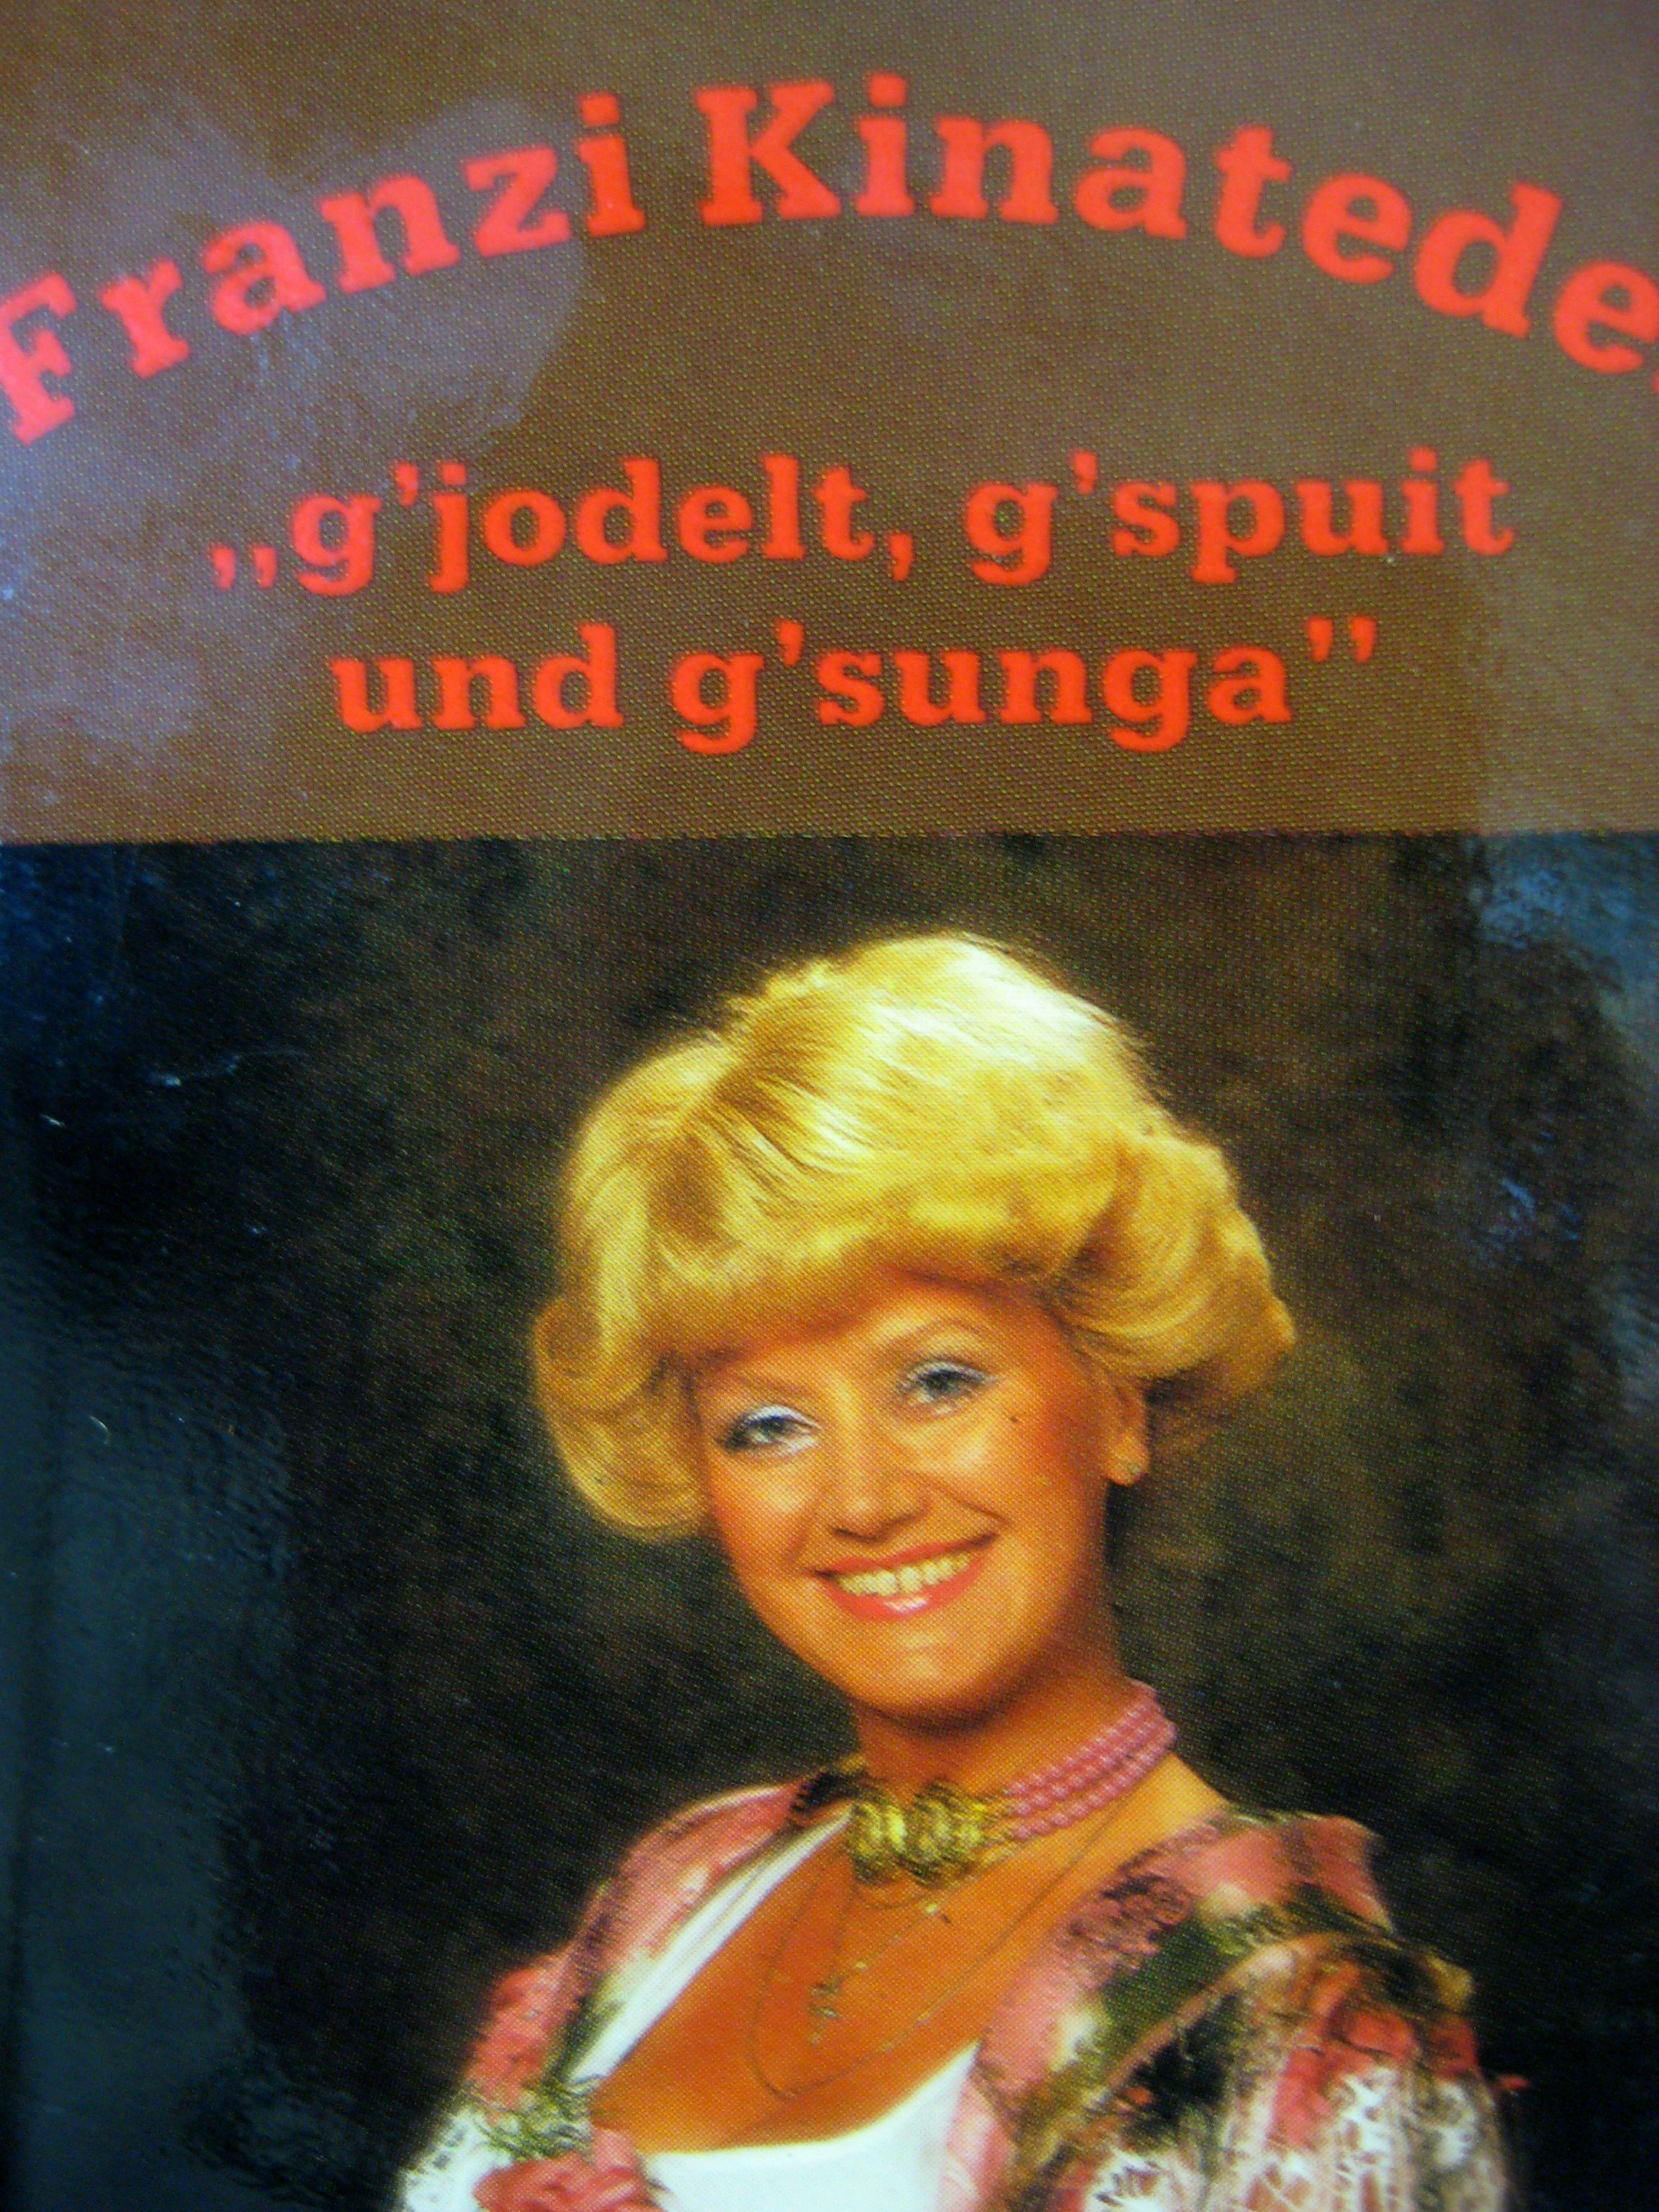 """g'jodelt, g'spuit und g'sunga"""